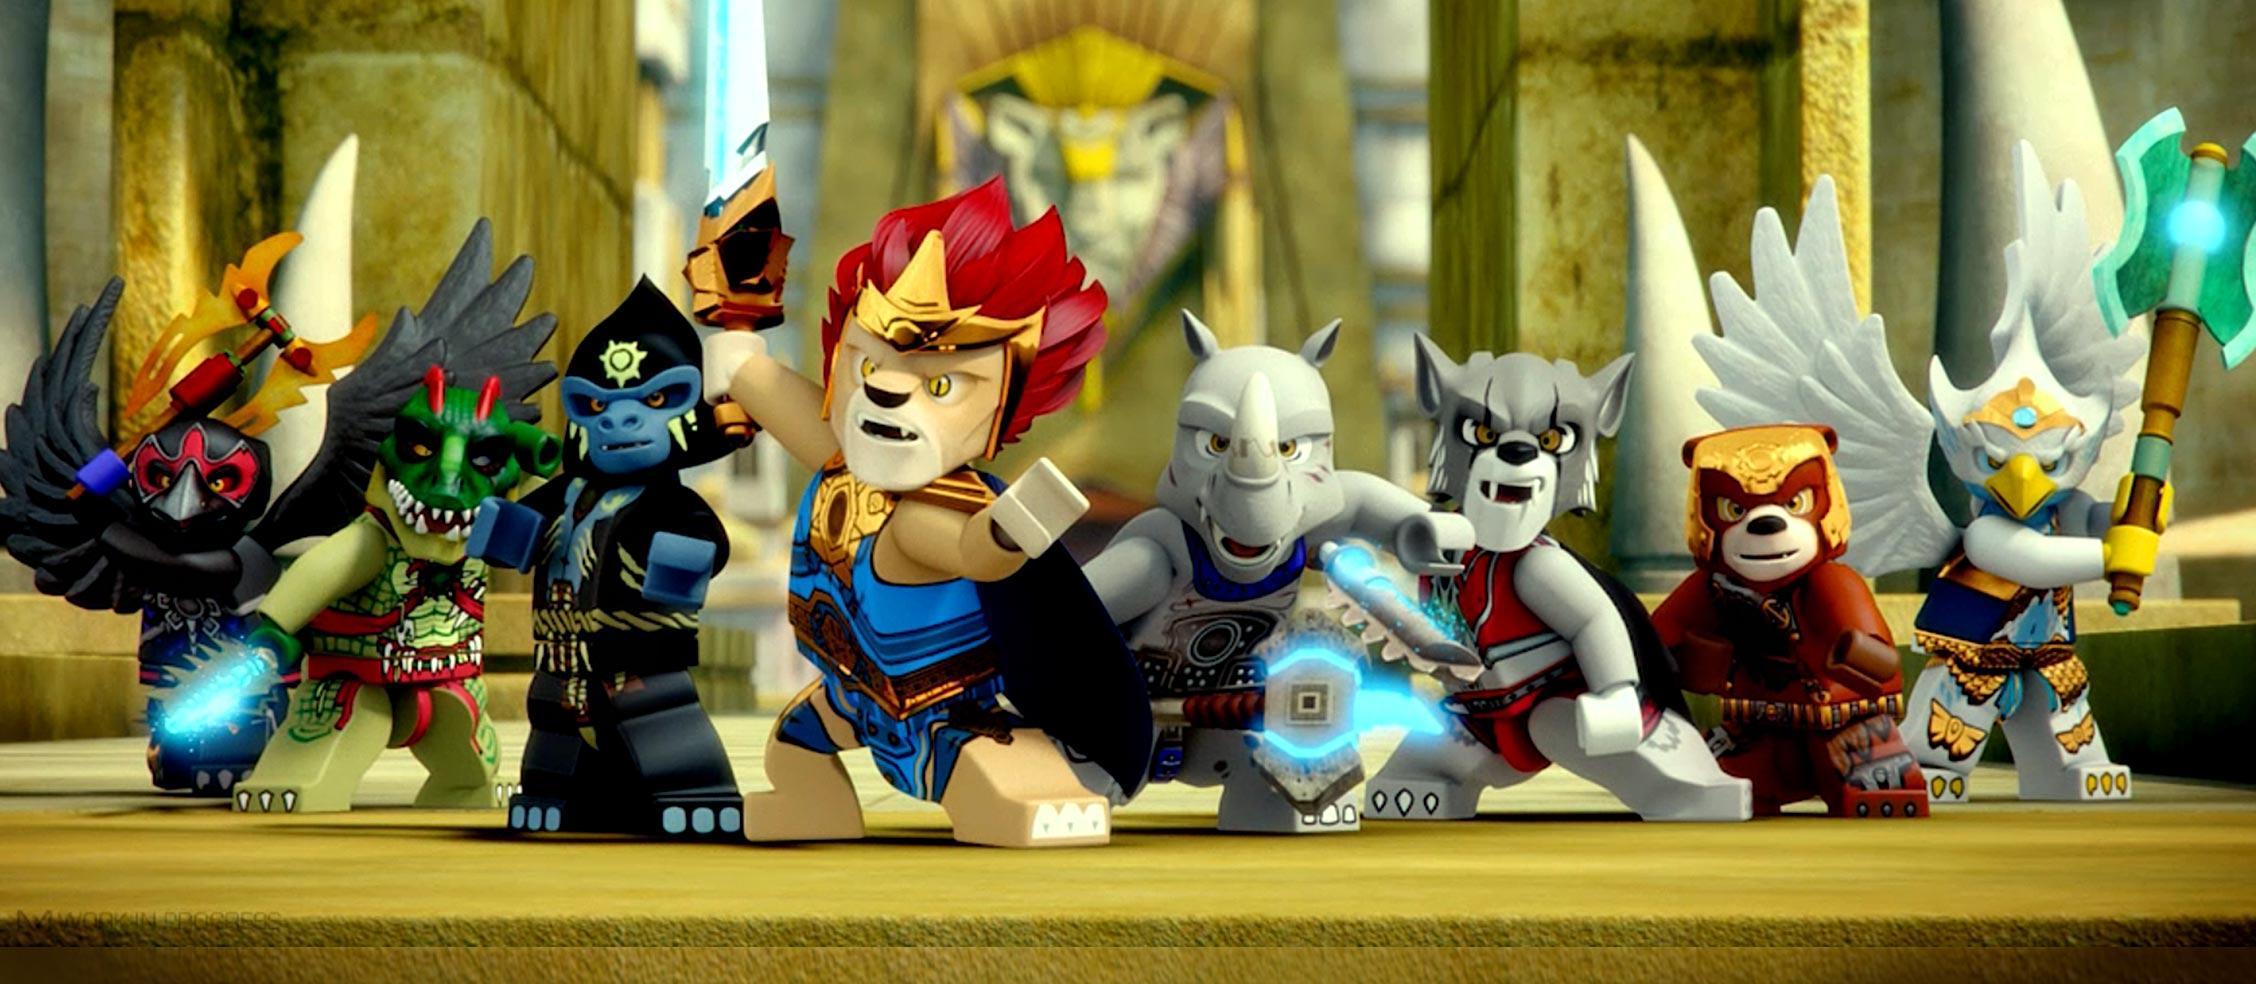 Lego chima furries know your meme - Image de lego chima ...